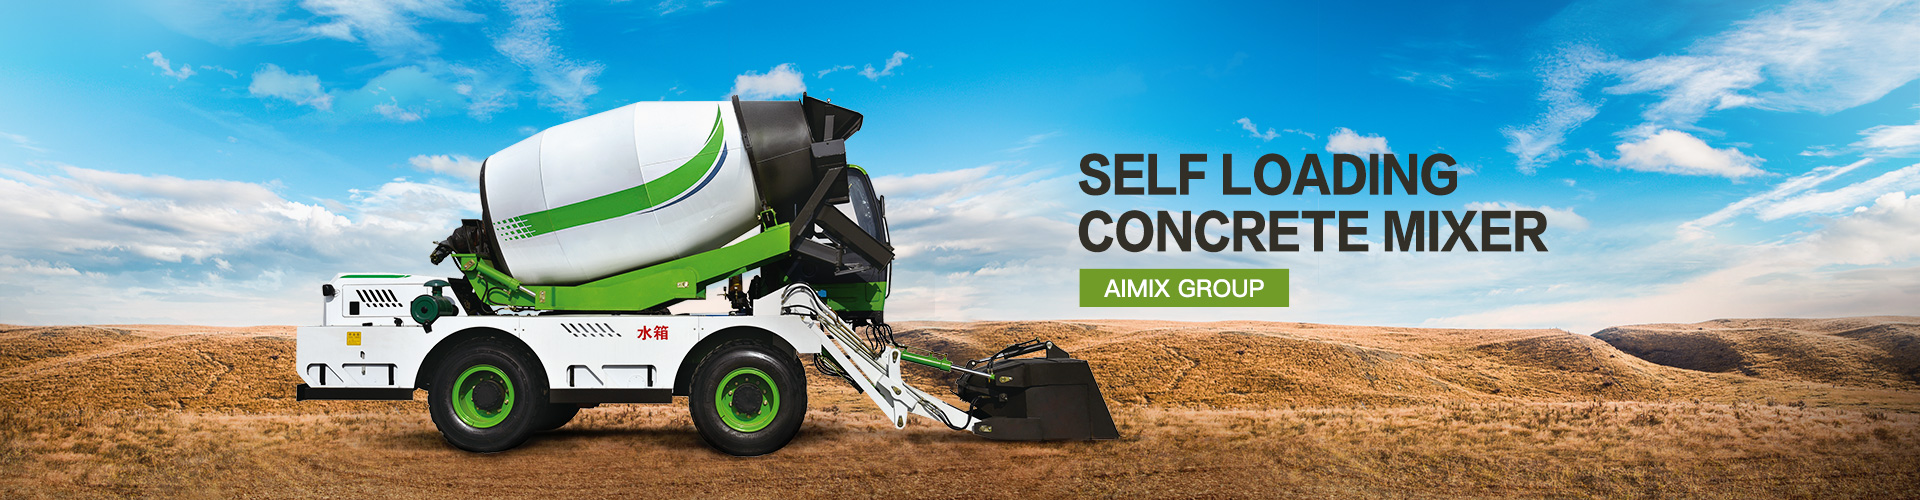 Aimix self loading concrete mixer for sale